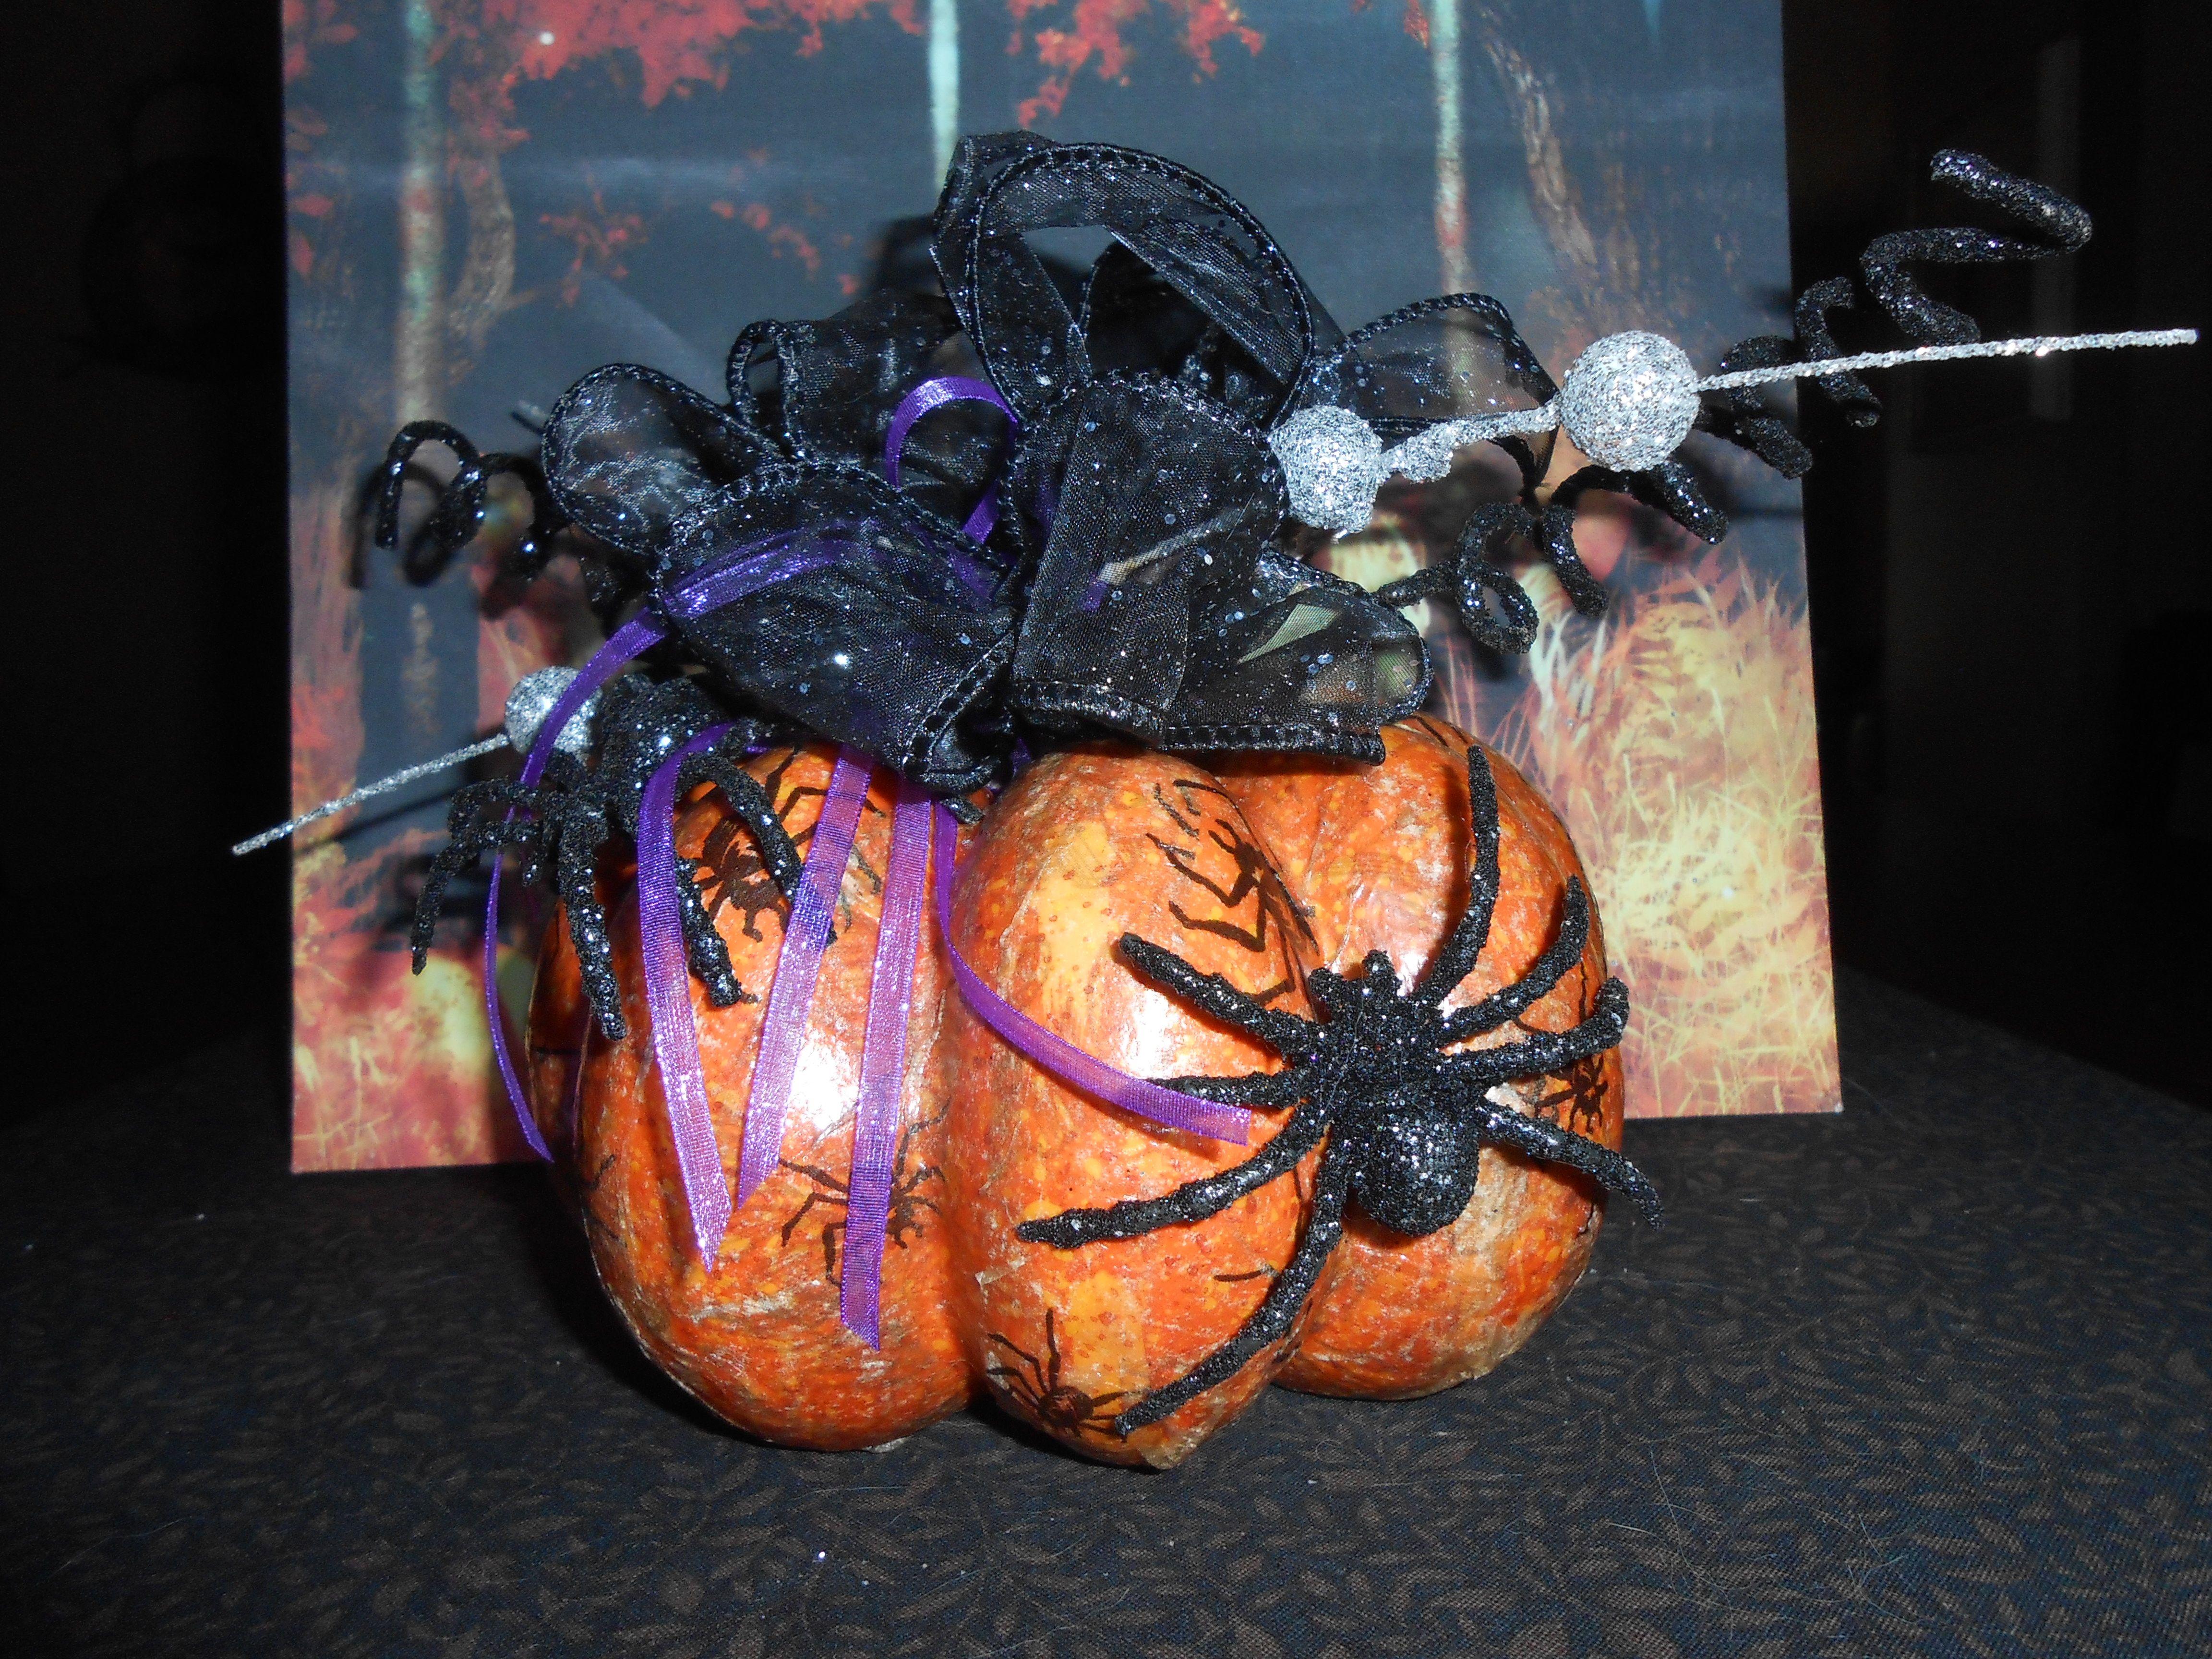 Styrofoam Pumpkin, Halloween Napkins (White Backing Peeled) Cut Into Strips